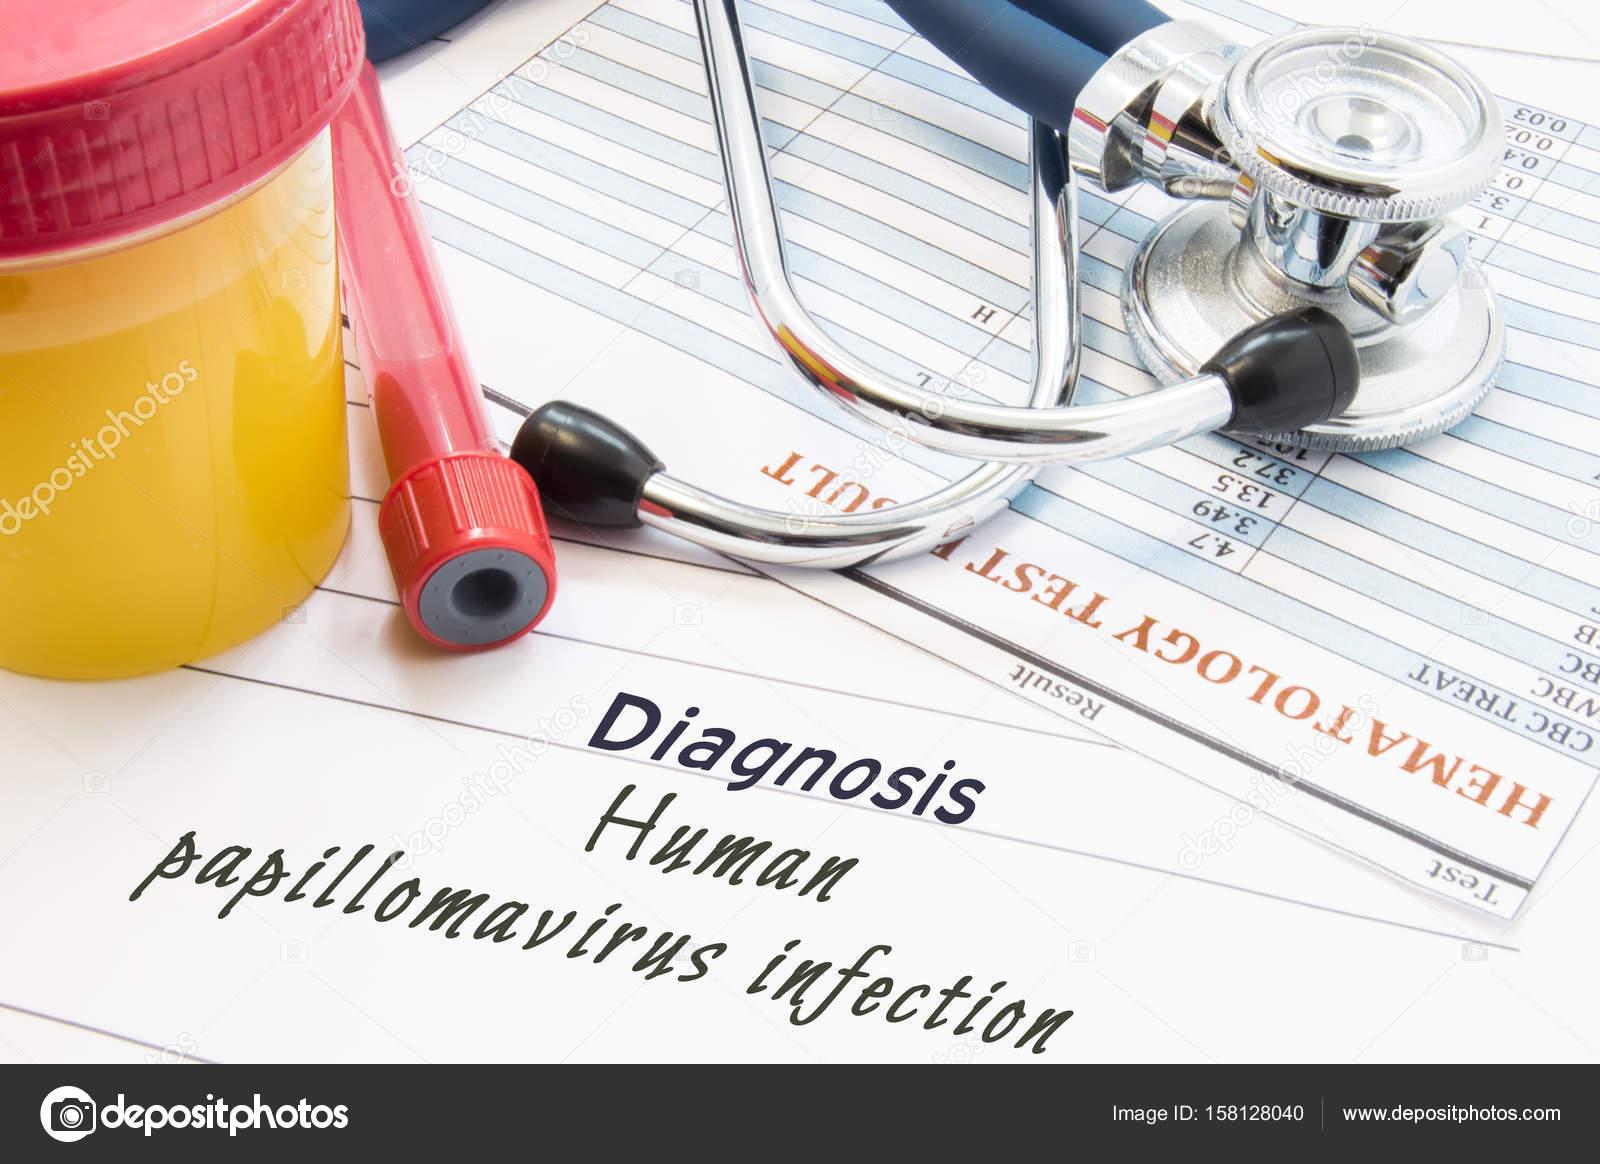 human papillomavirus infection diagnostic